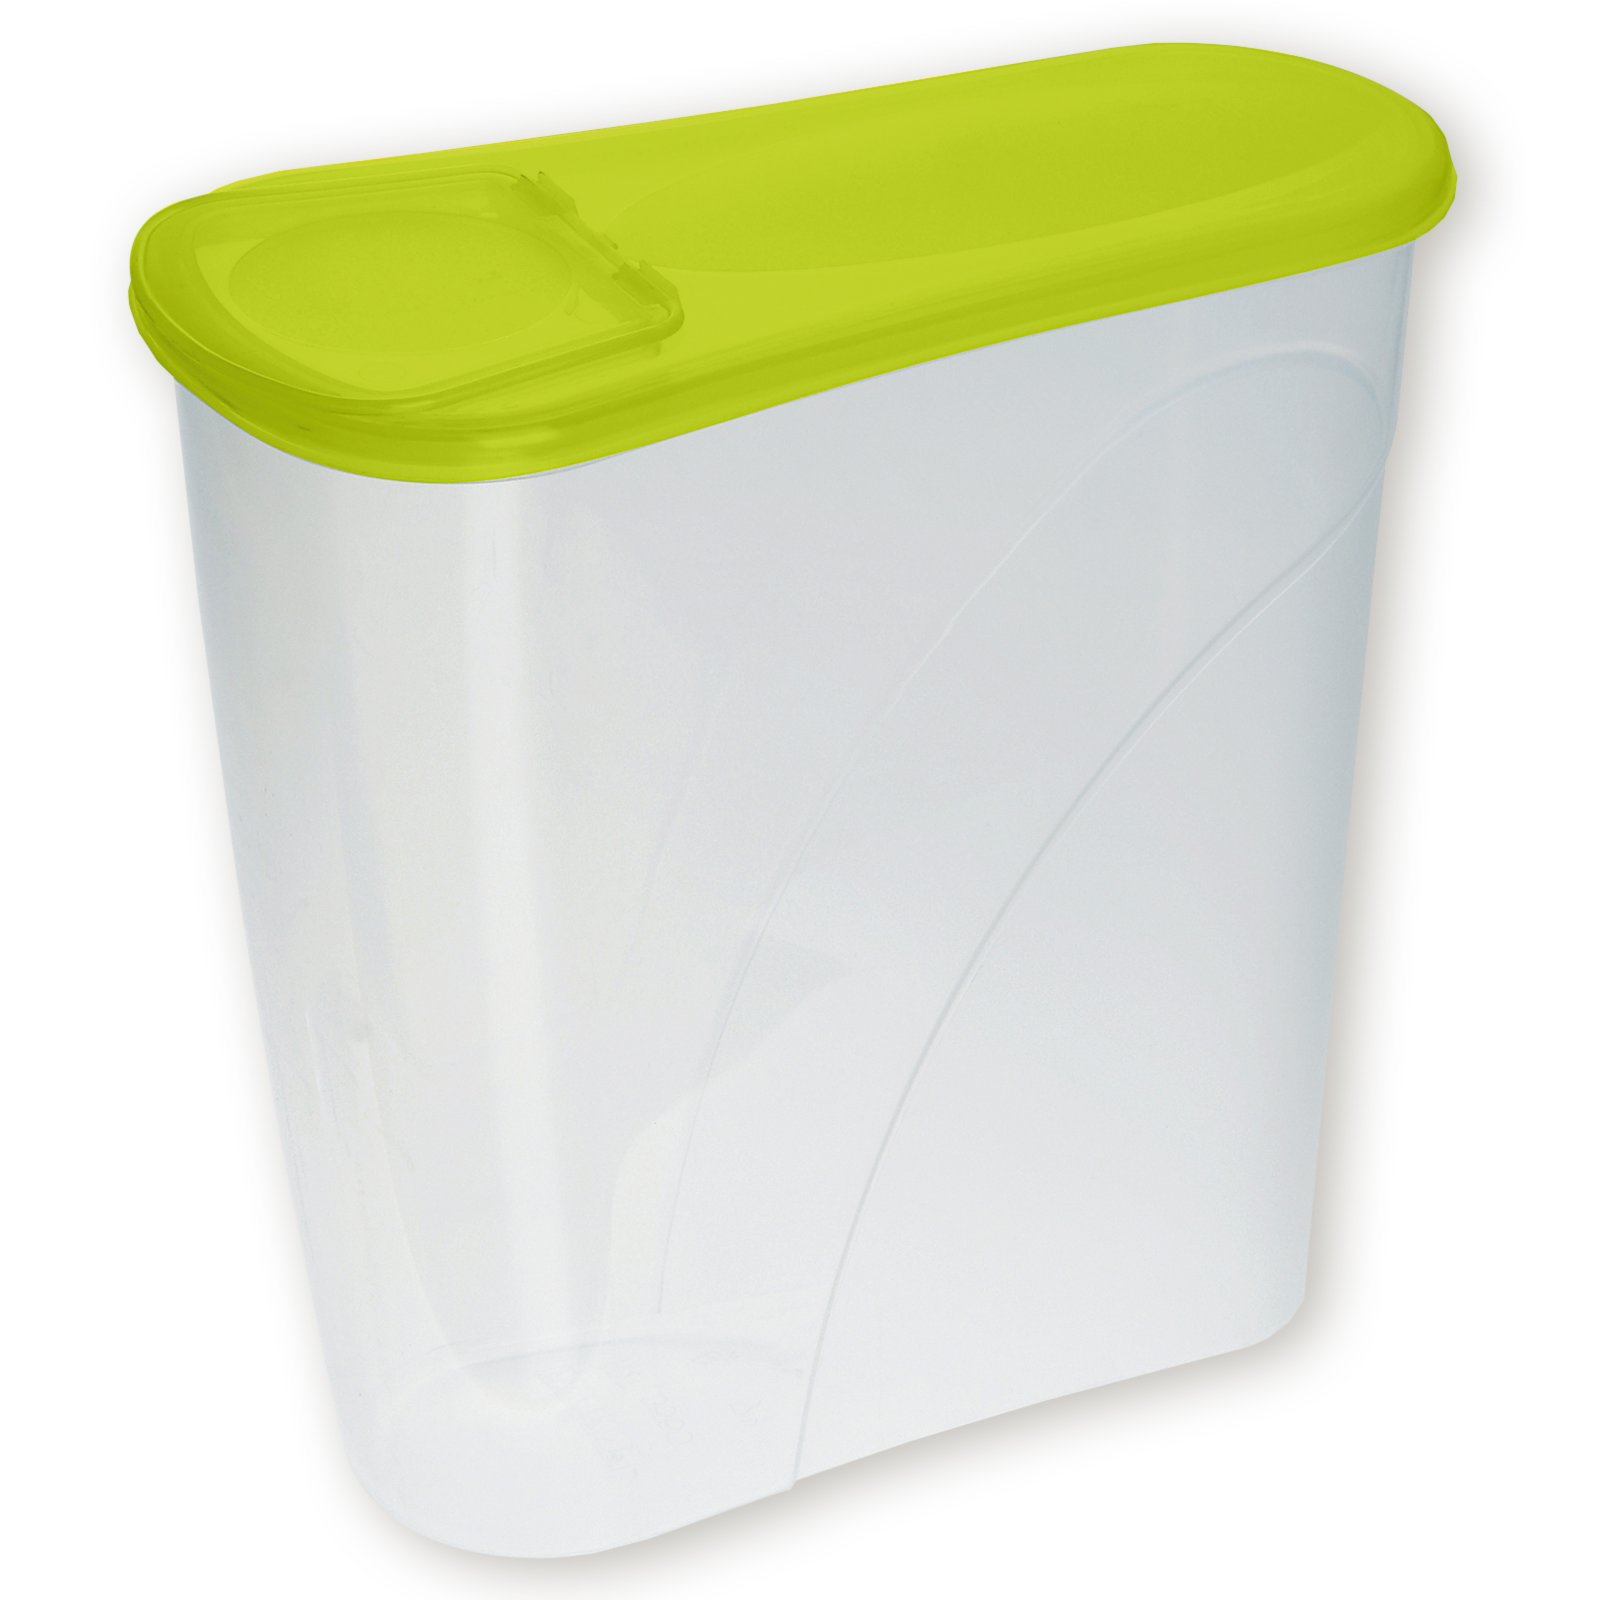 Schüttdose - lime - 2,6 Liter